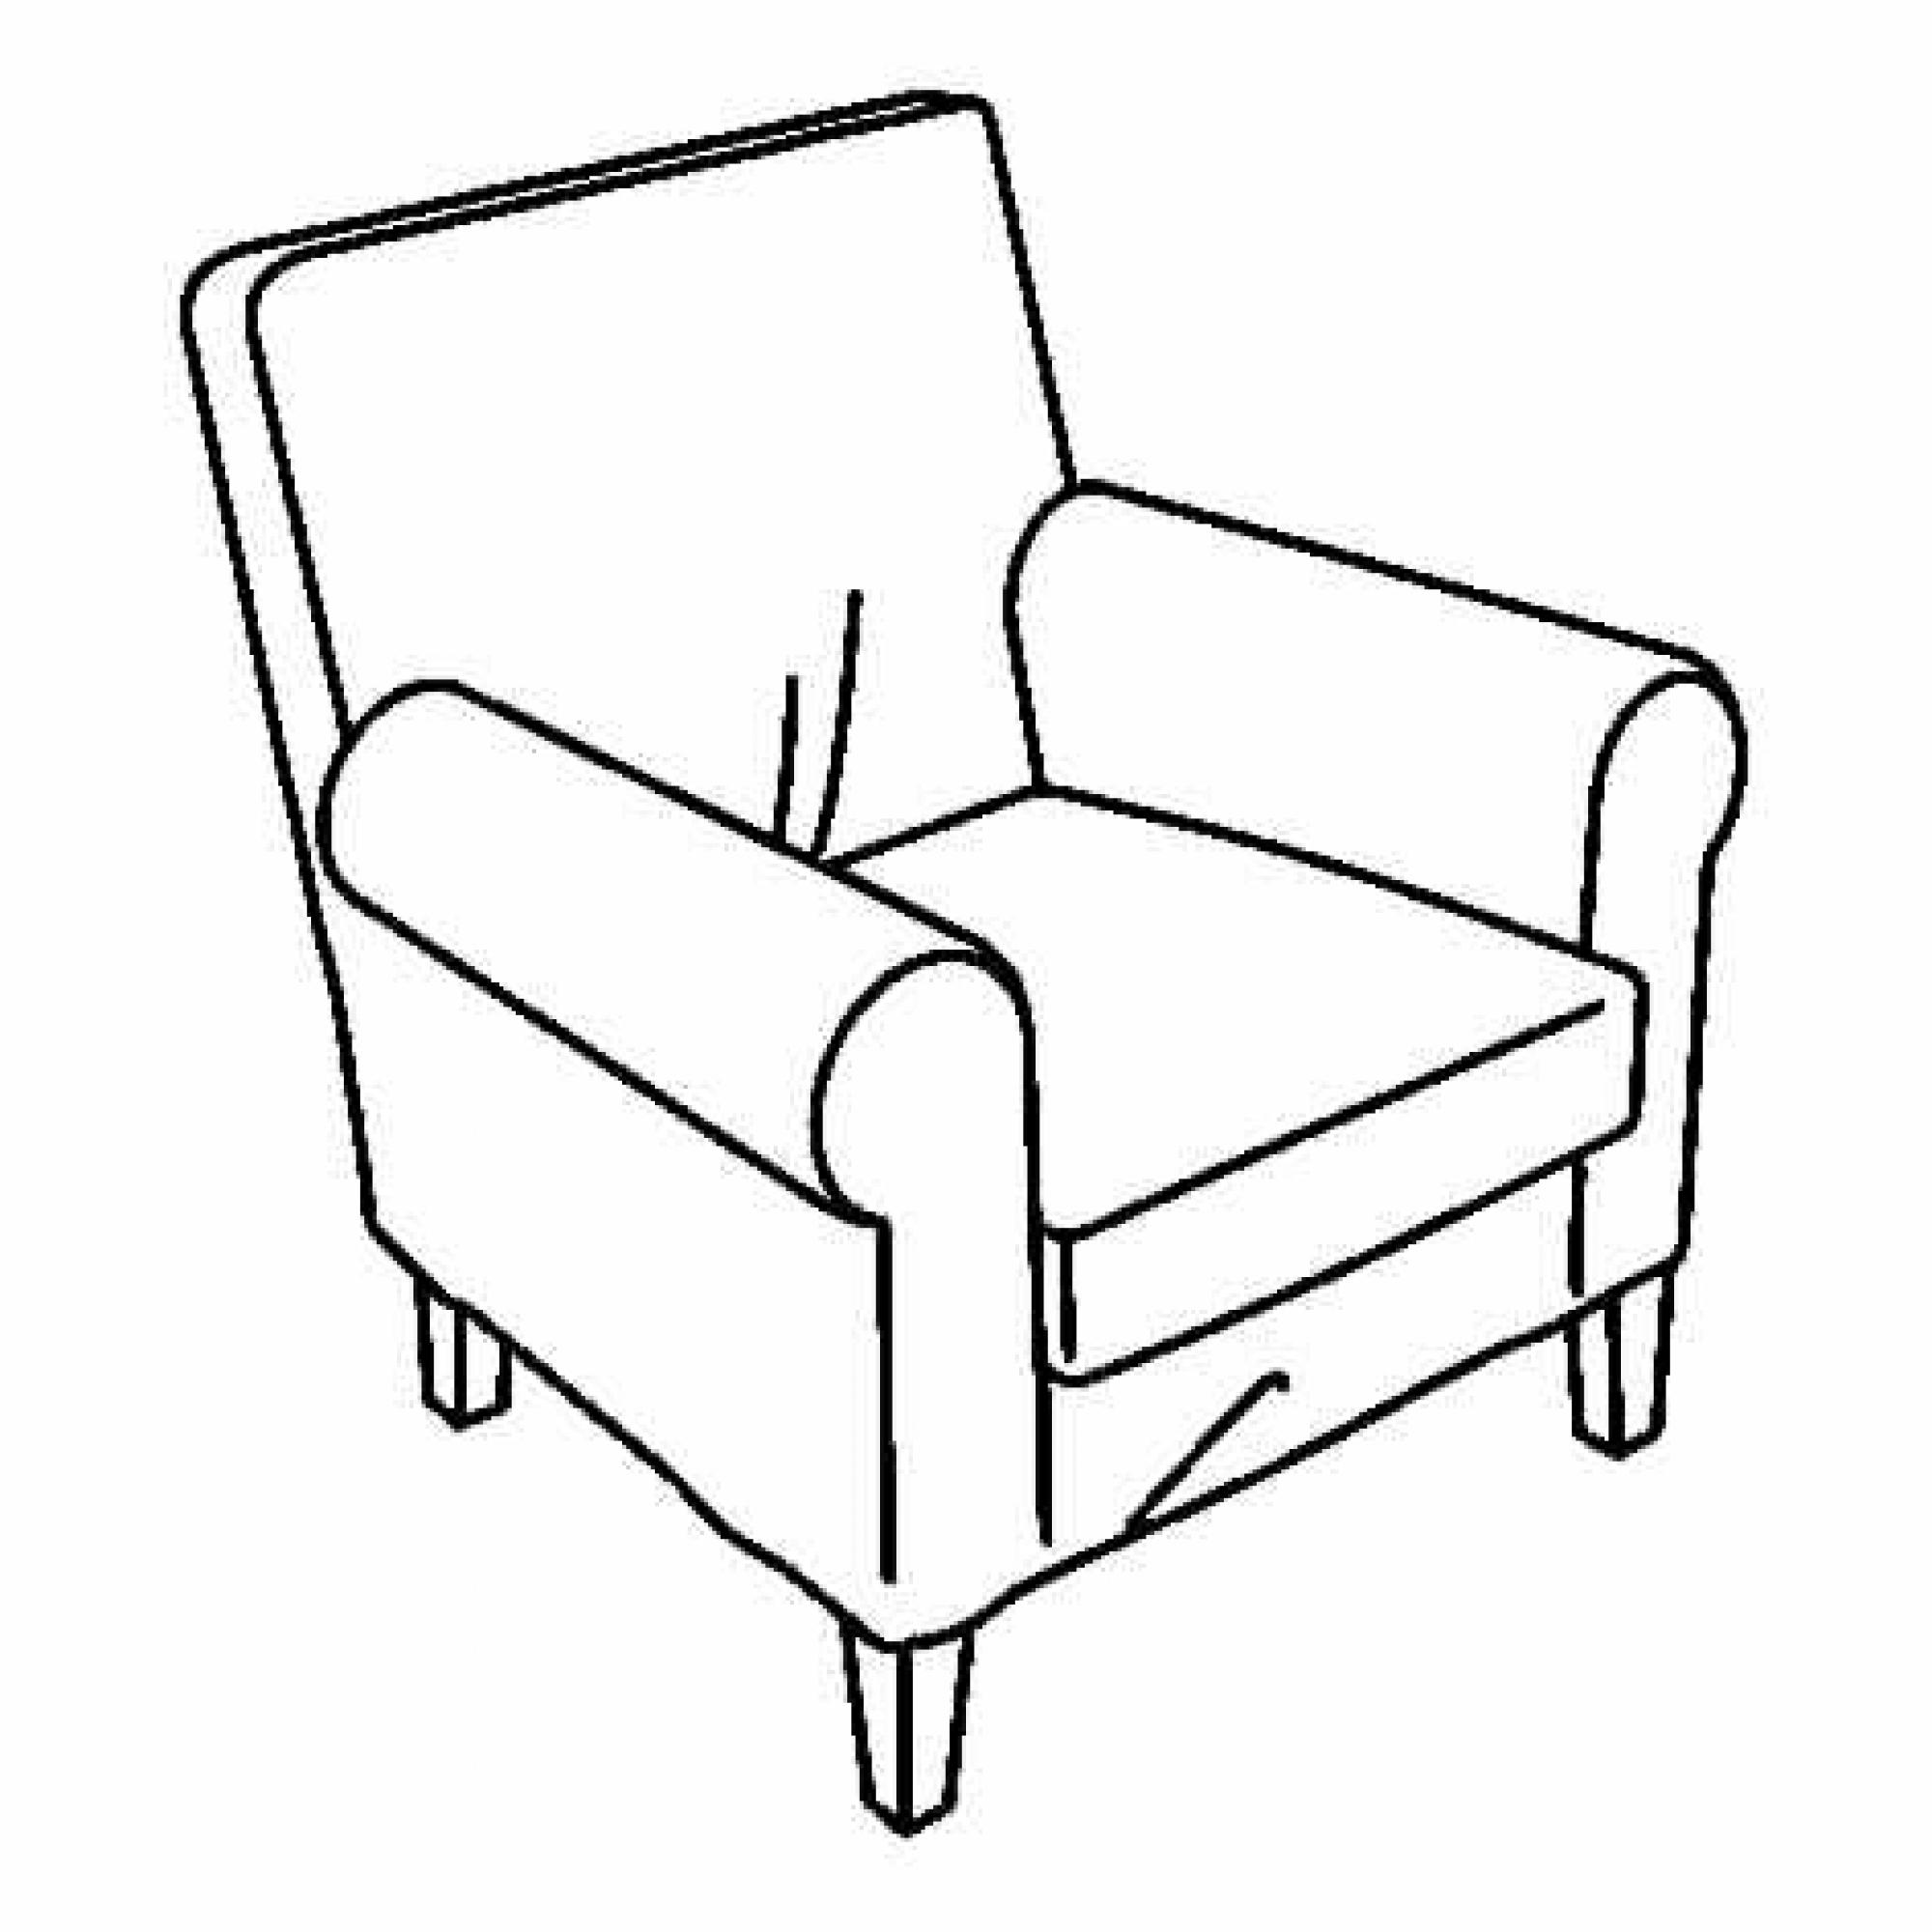 ektorp jennylund armchair frame Ikea Home Planner Change To Metric Ikea Home Planner Change To Metric #8 ikea home planner change to metric